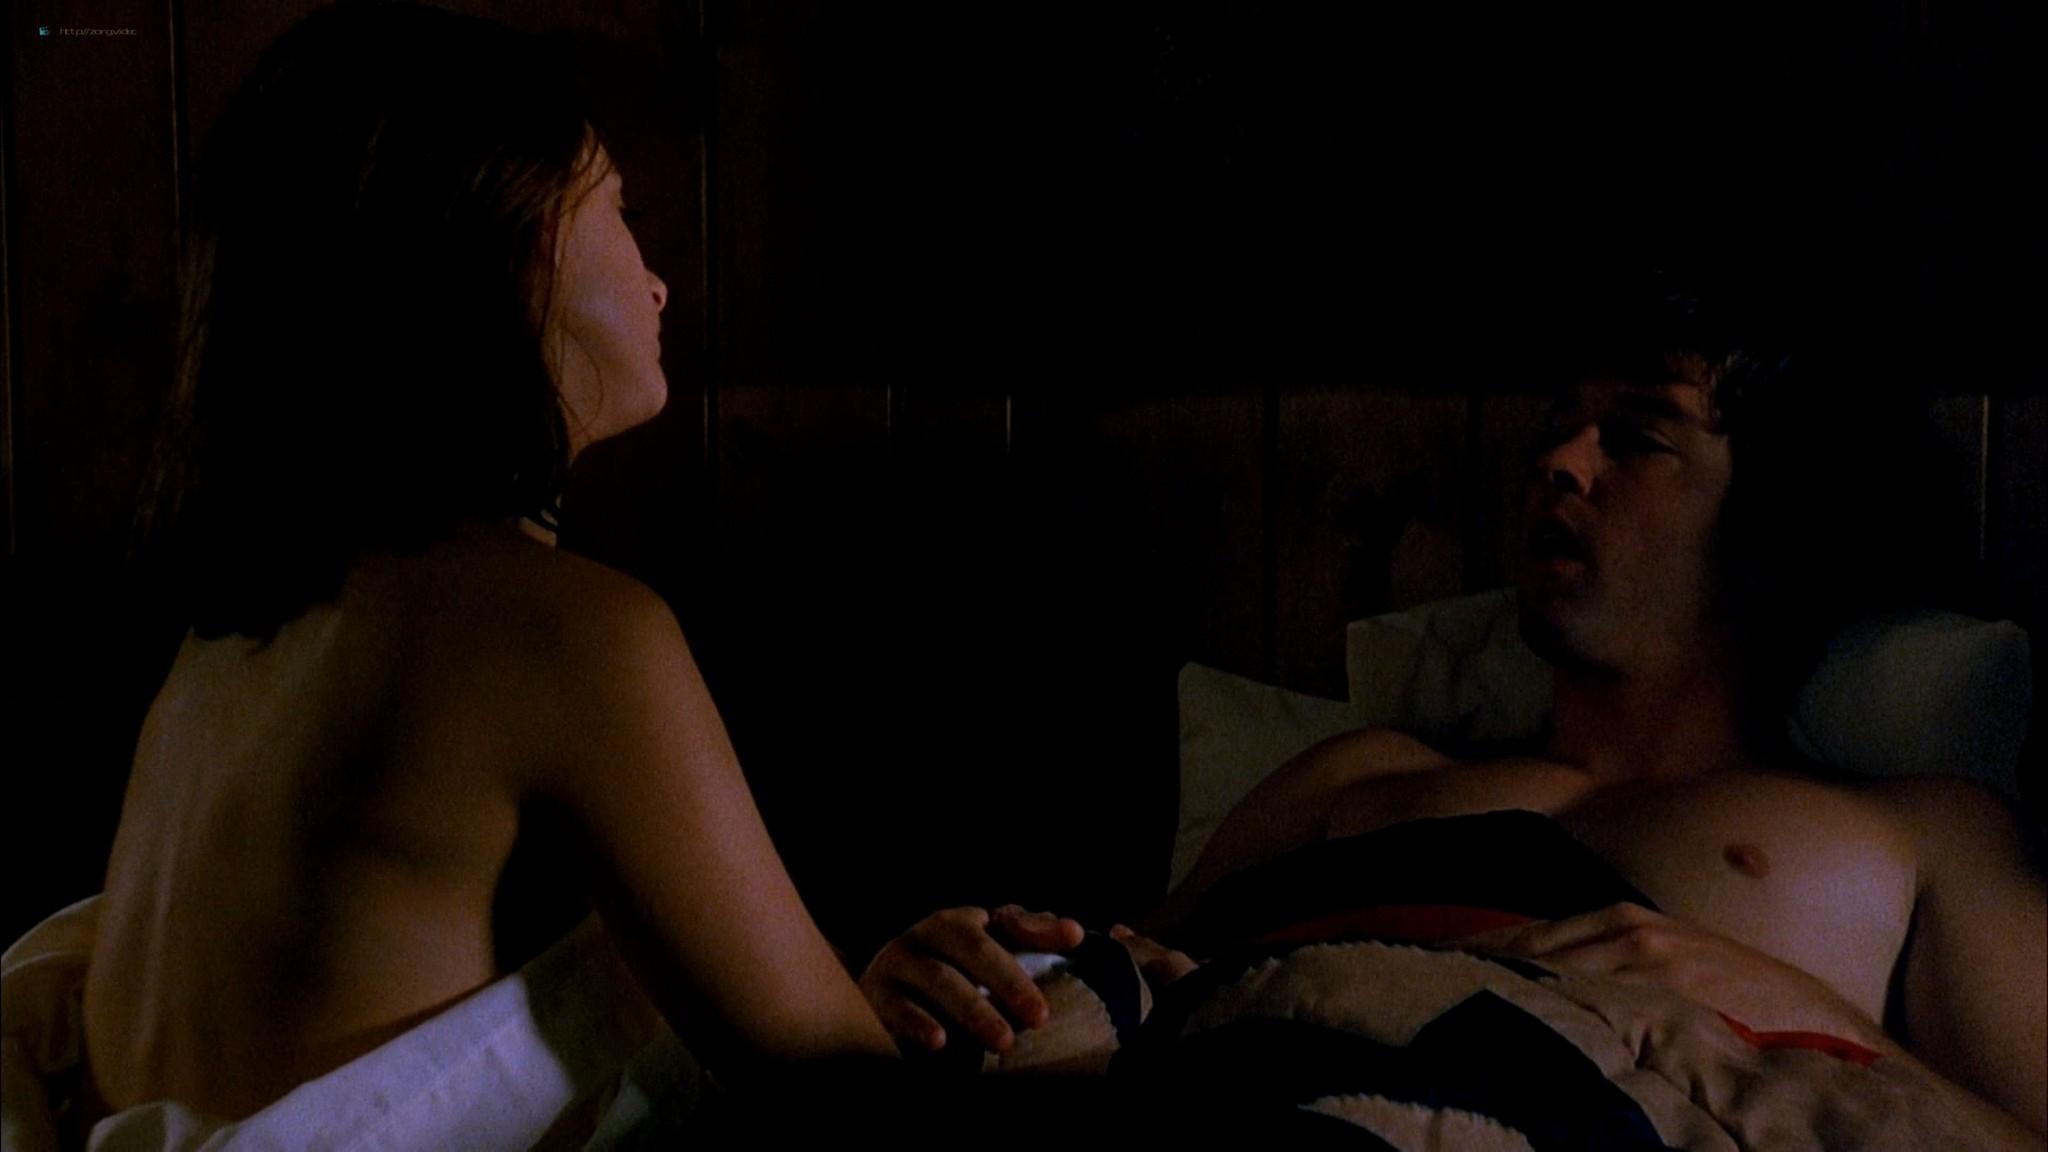 Marlee Matlin nude topless at the tub - Hear No Evil (1993) HD 1080p Web (4)